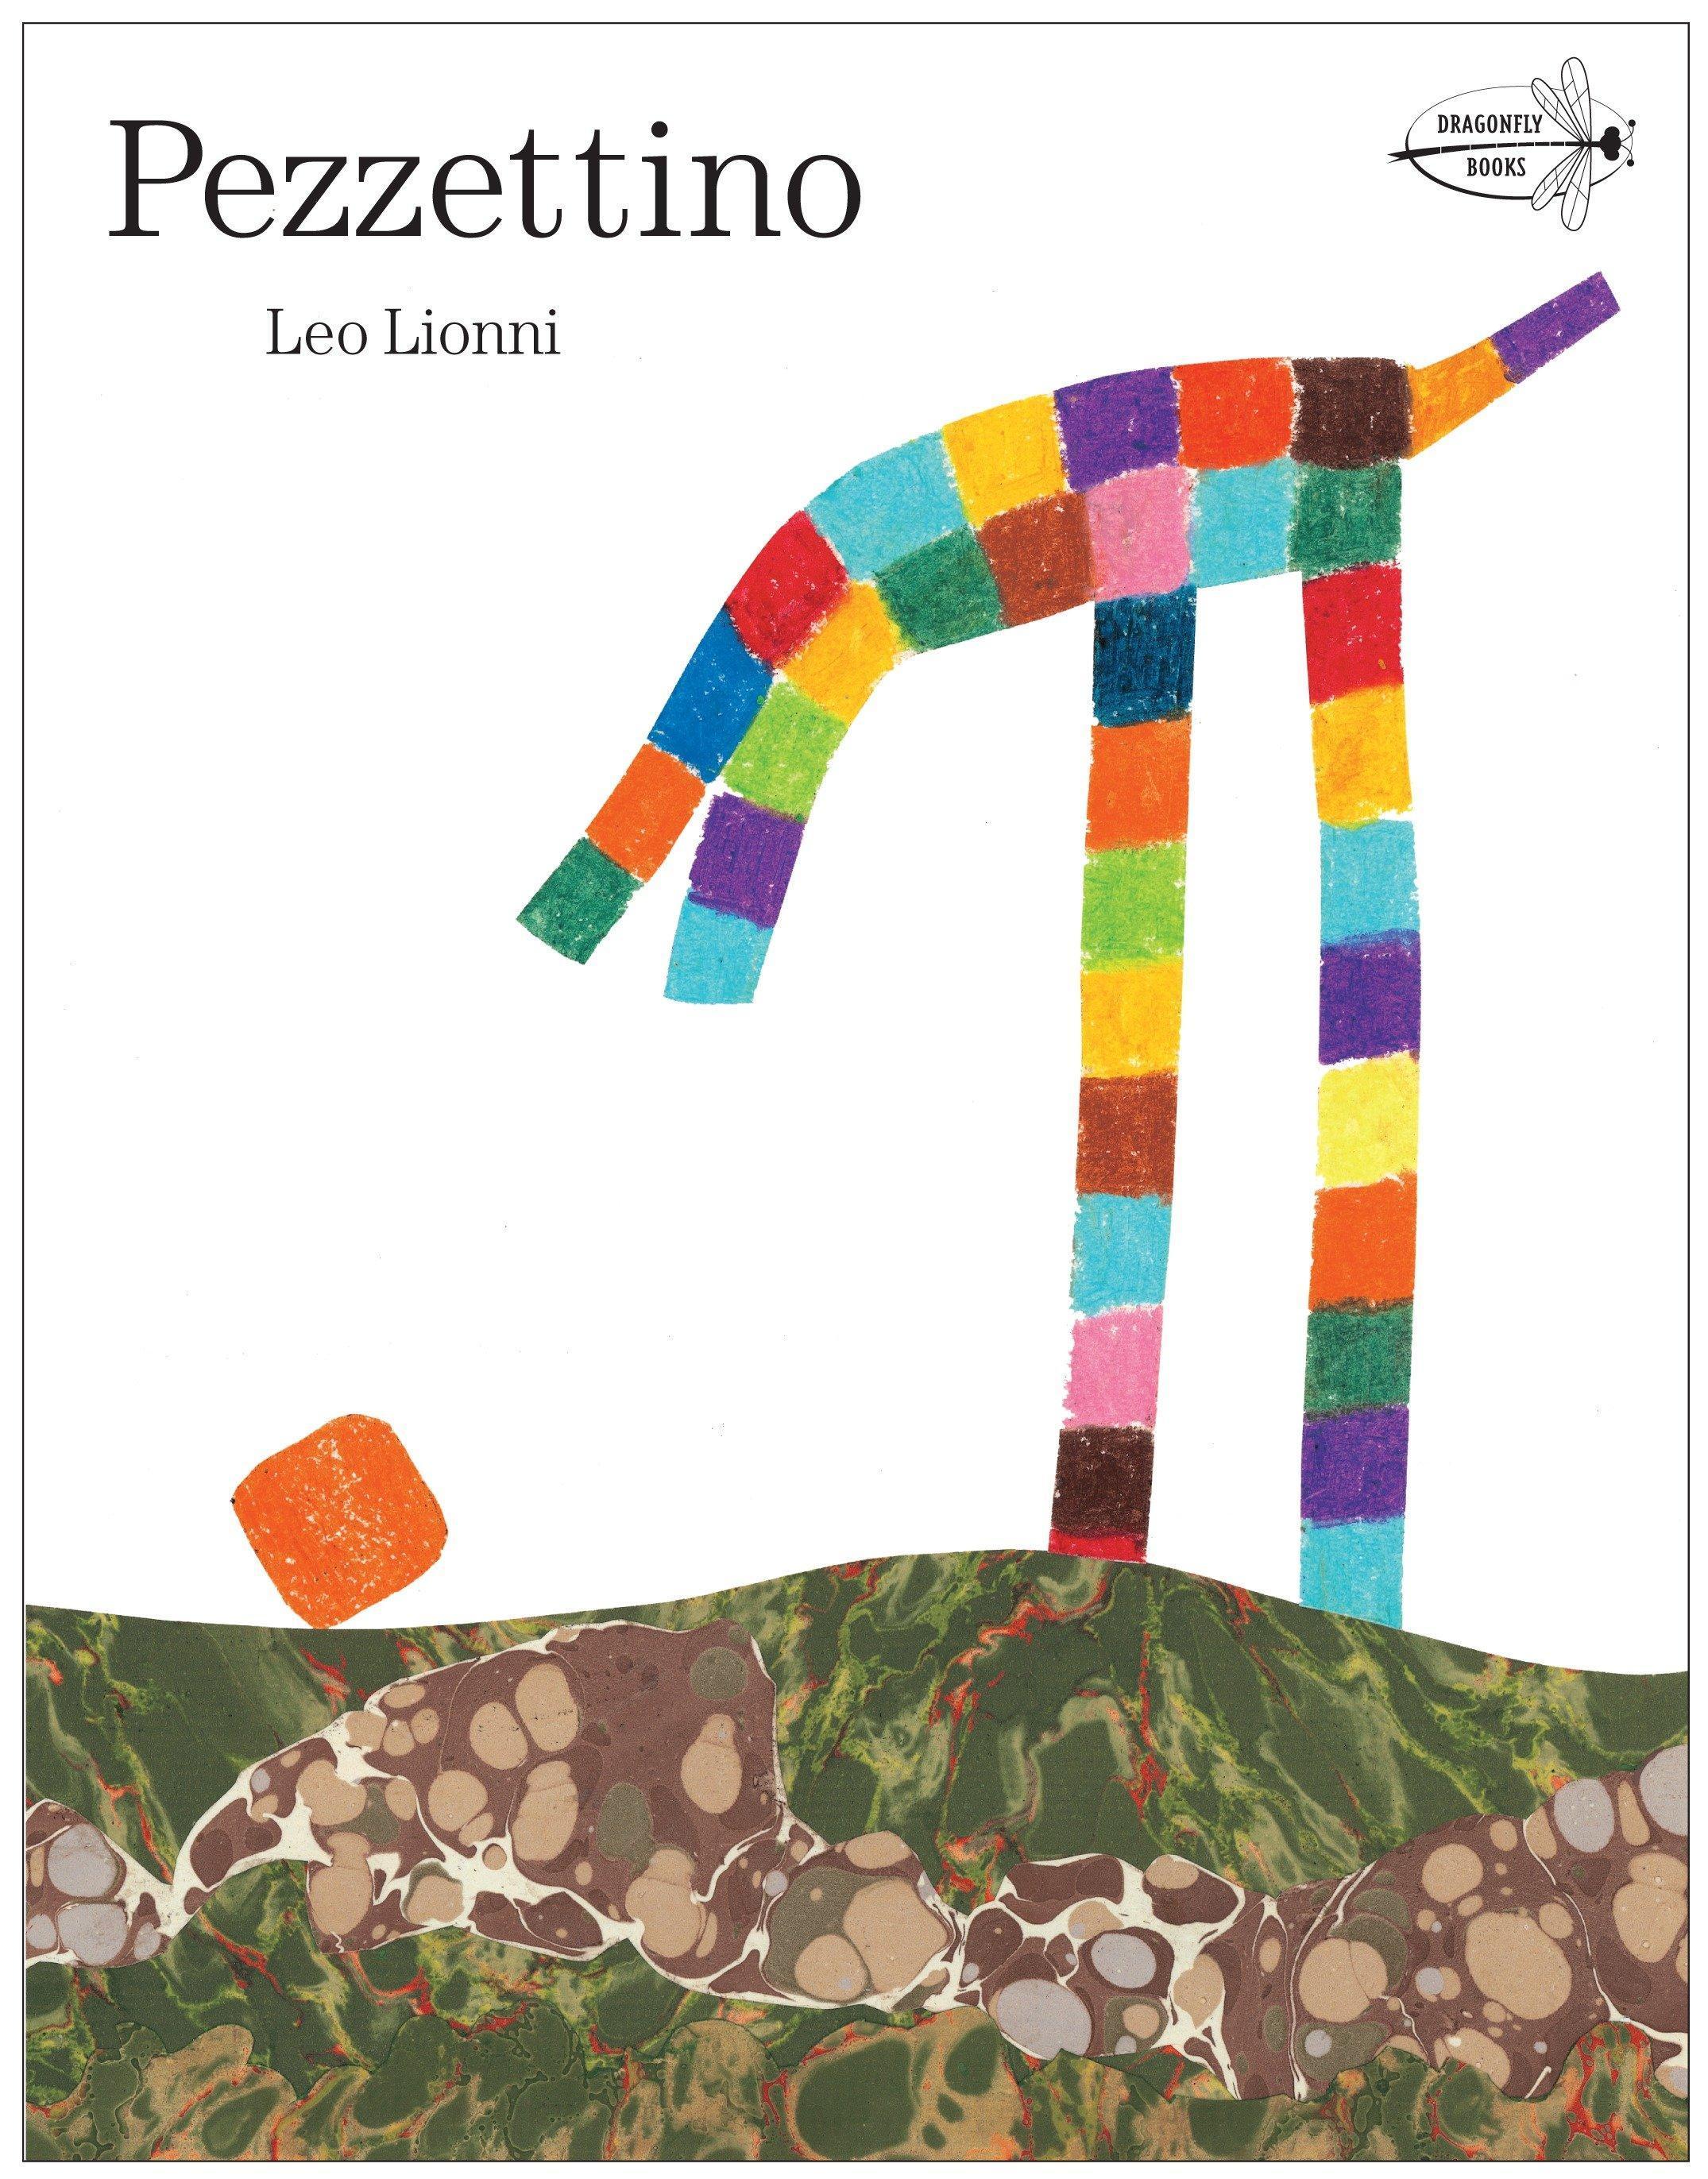 Leo Lionni ~ Pezzettino, English edition 9780307929990